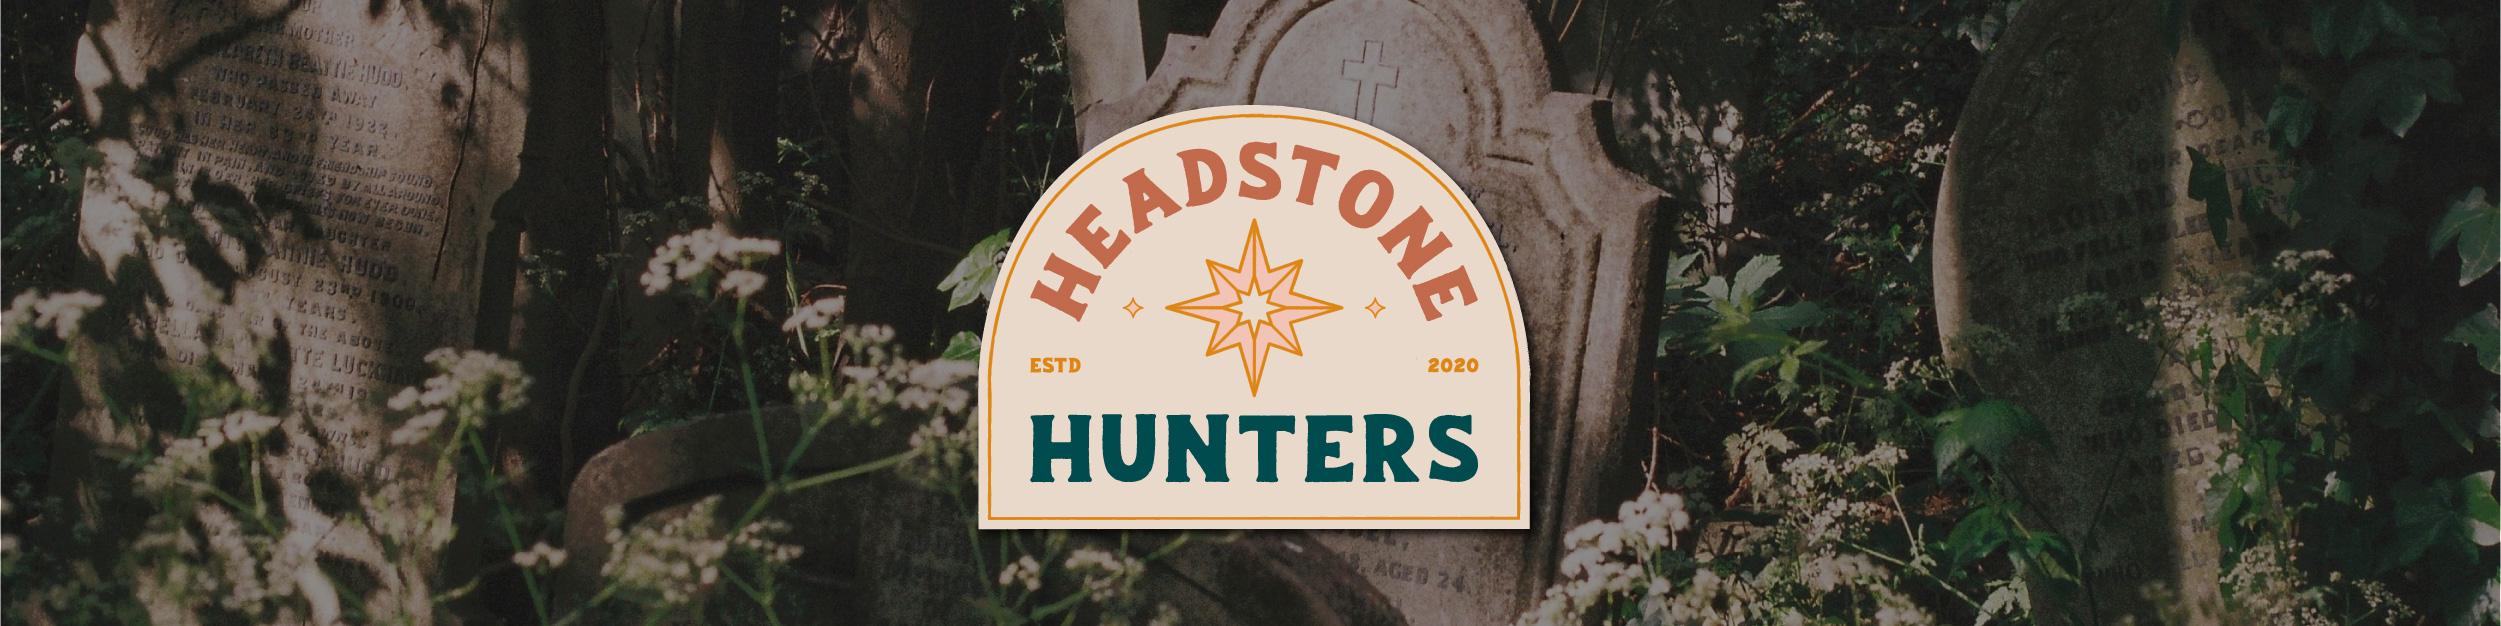 Headstone Hunters